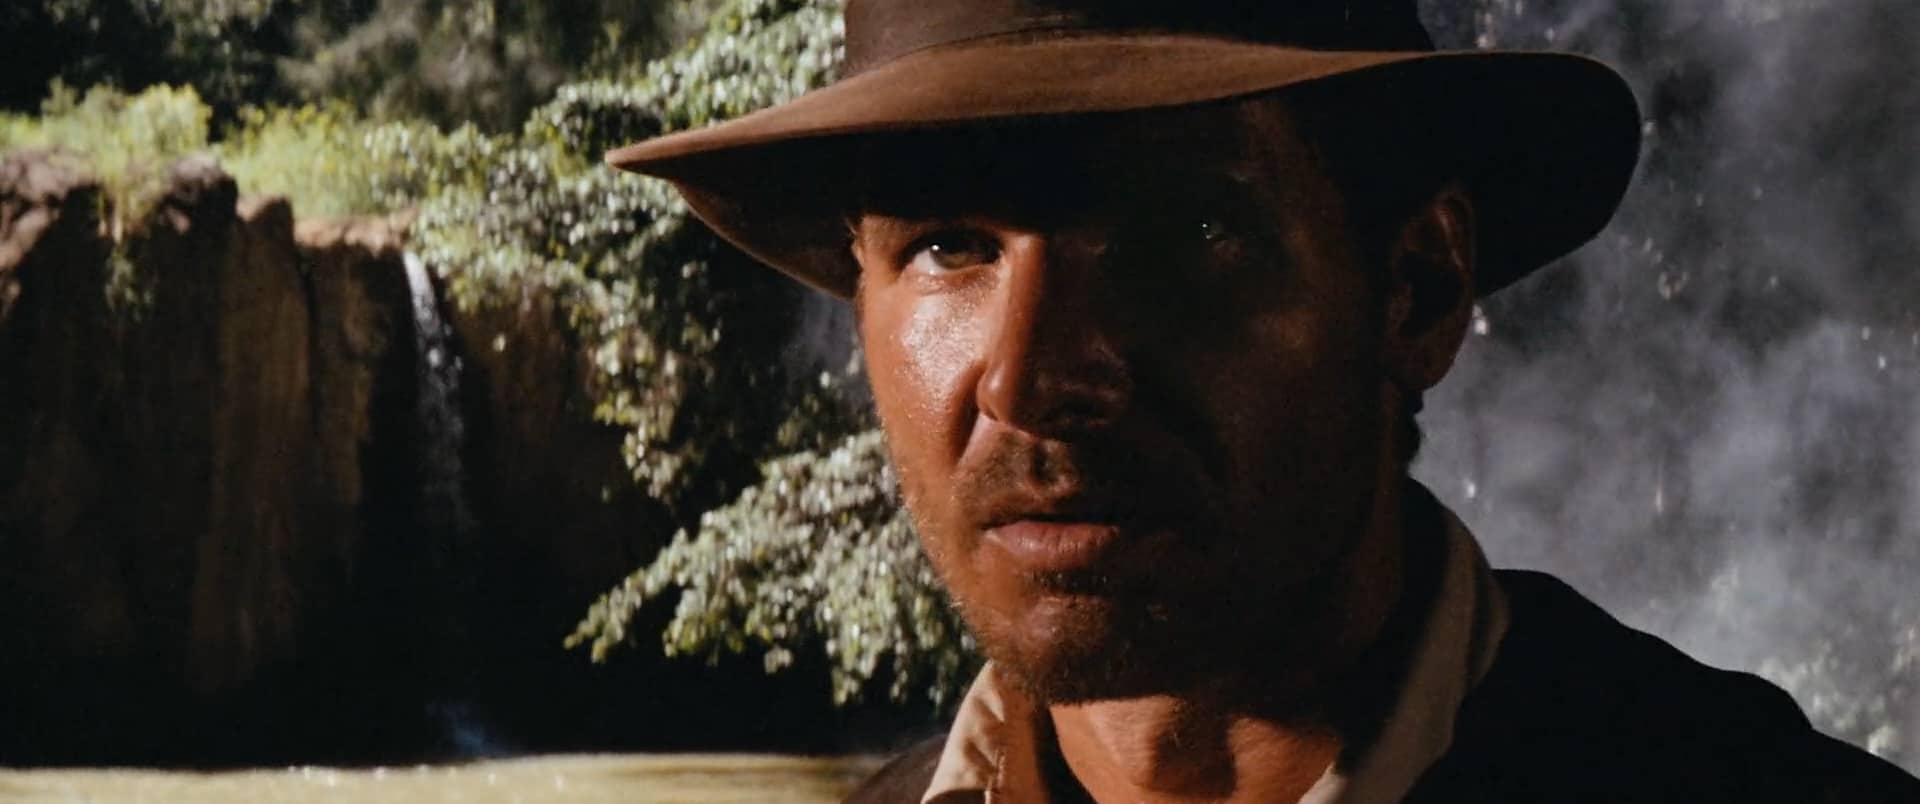 Raiders of the Lost Ark – opening scene in movie